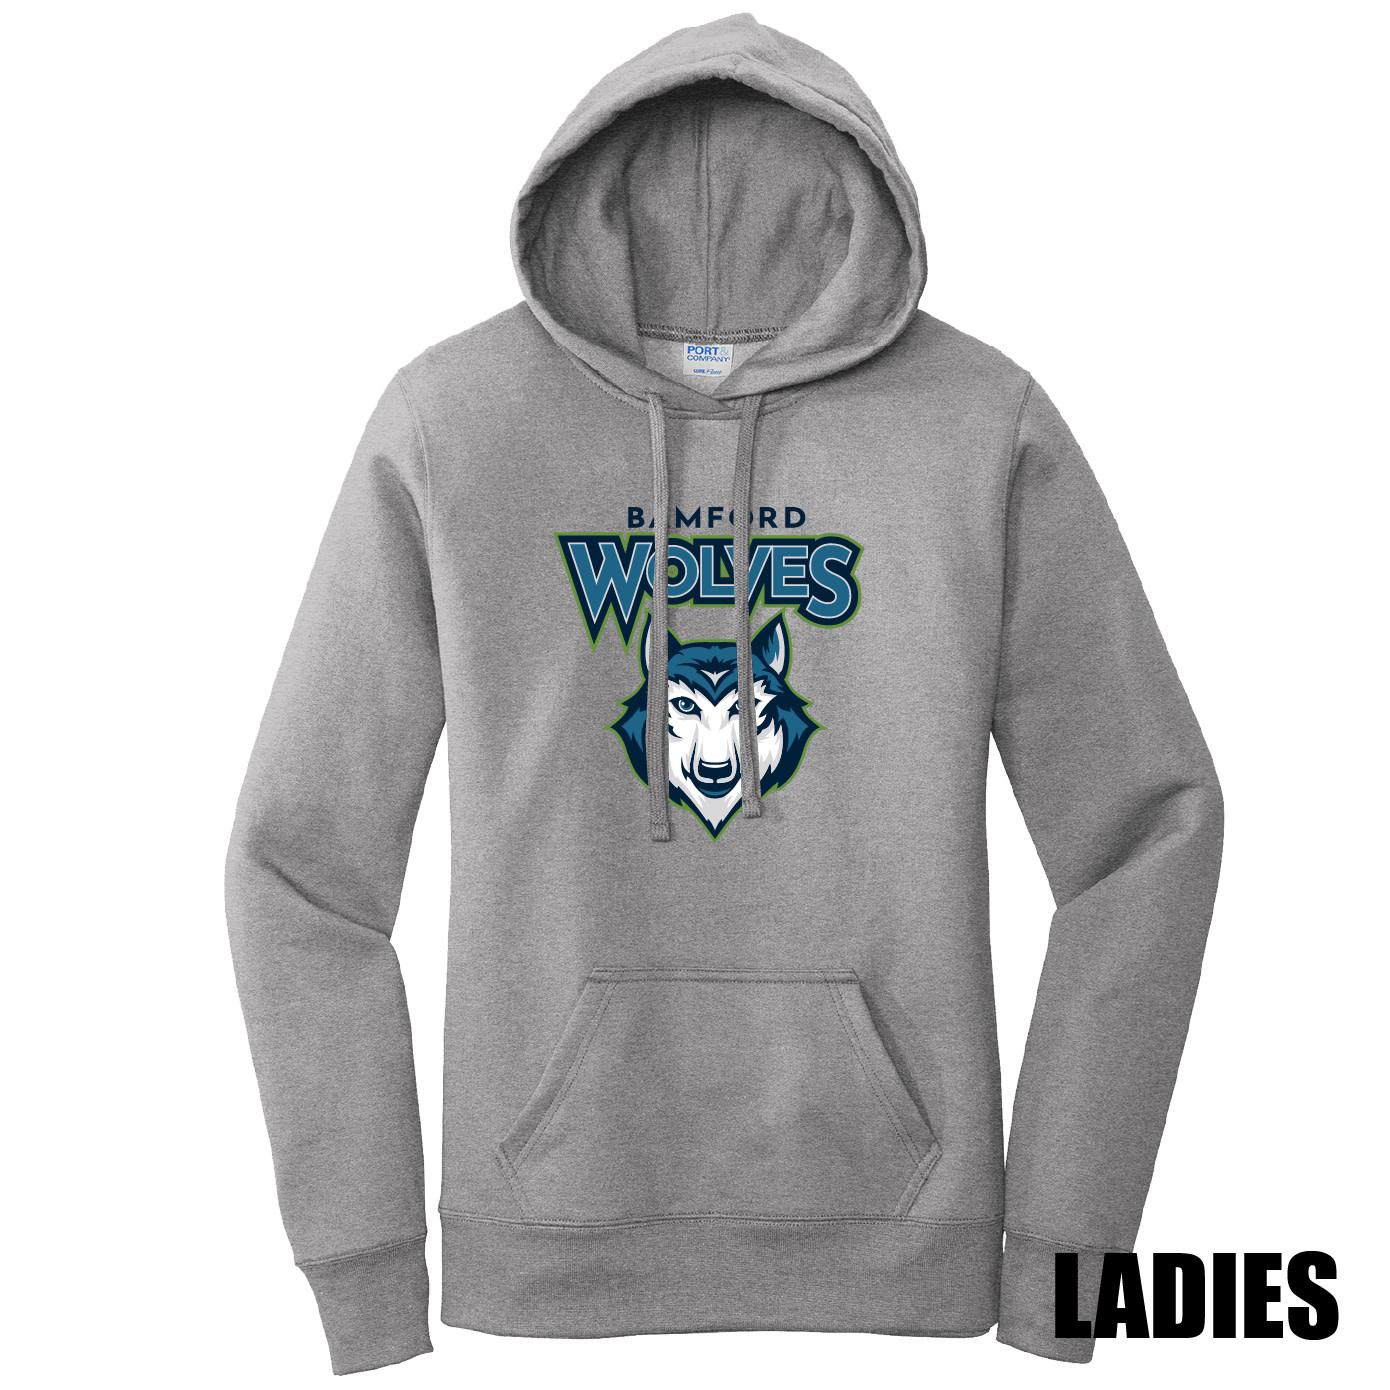 Port Authority Port & Company Ladies Core Fleece Pullover Hooded Sweatshirt (Athletic Heather)